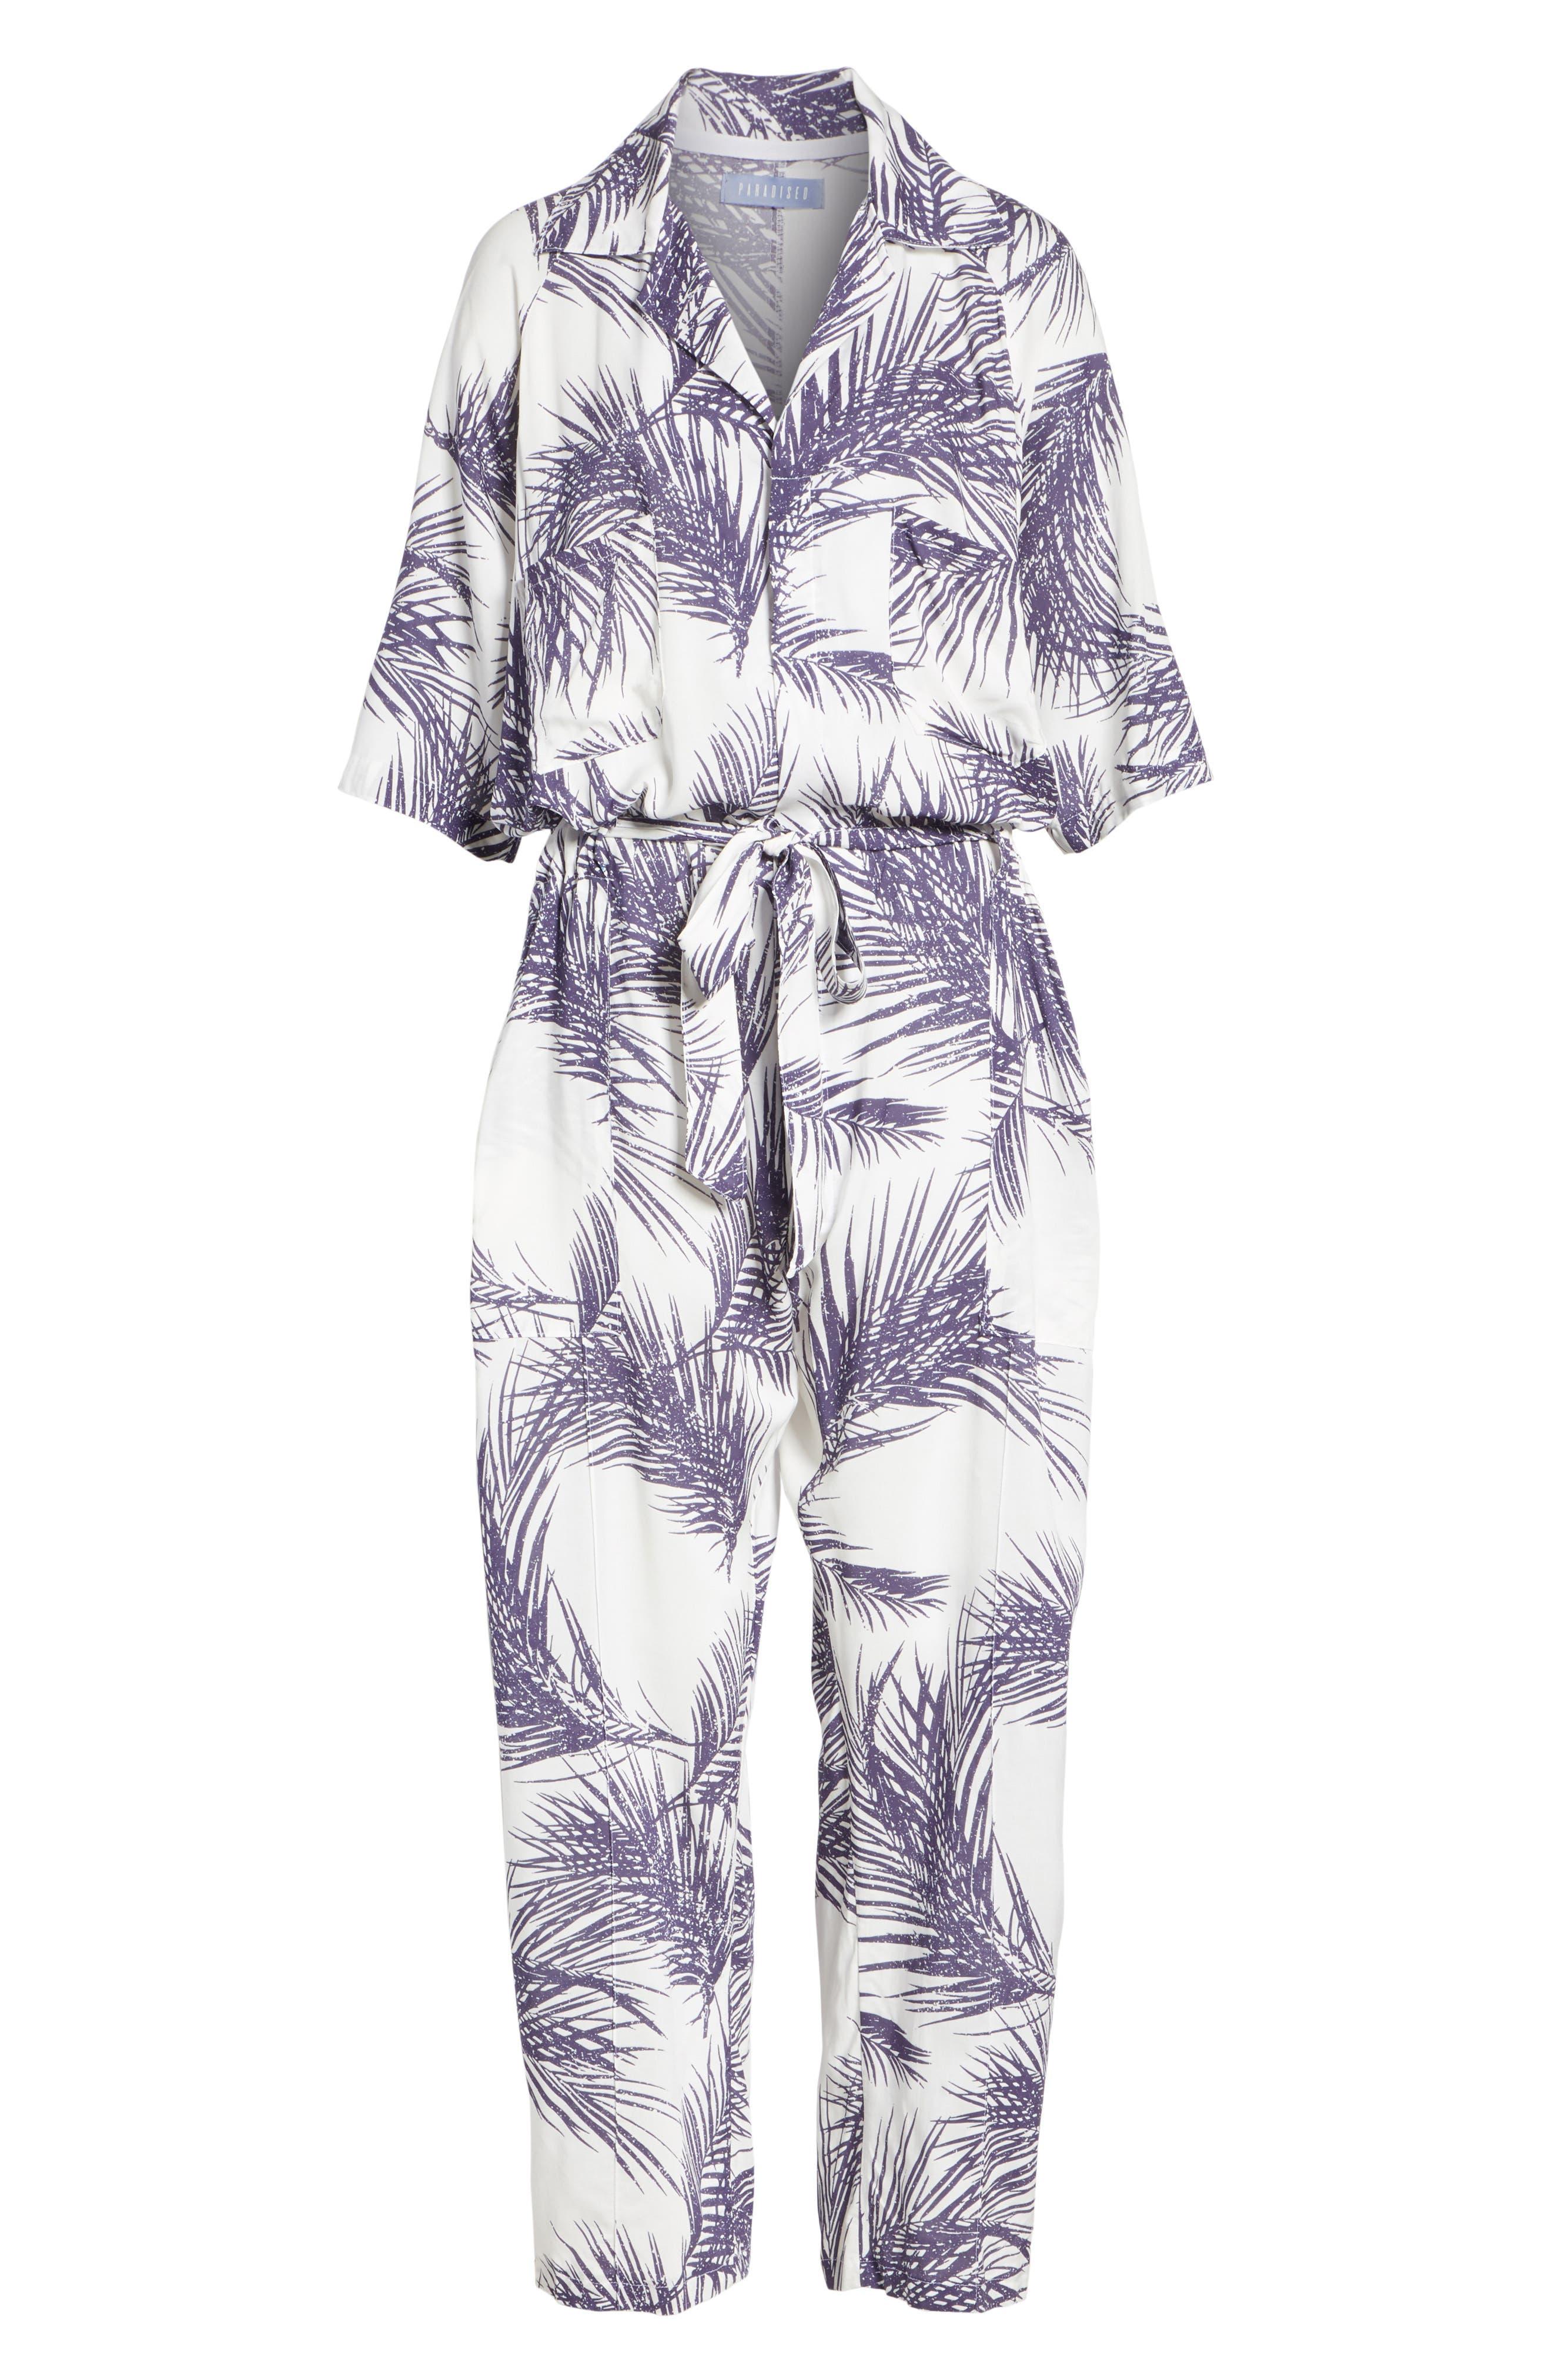 Apres Beach Print Jumpsuit,                             Alternate thumbnail 6, color,                             White/ Dark Purple